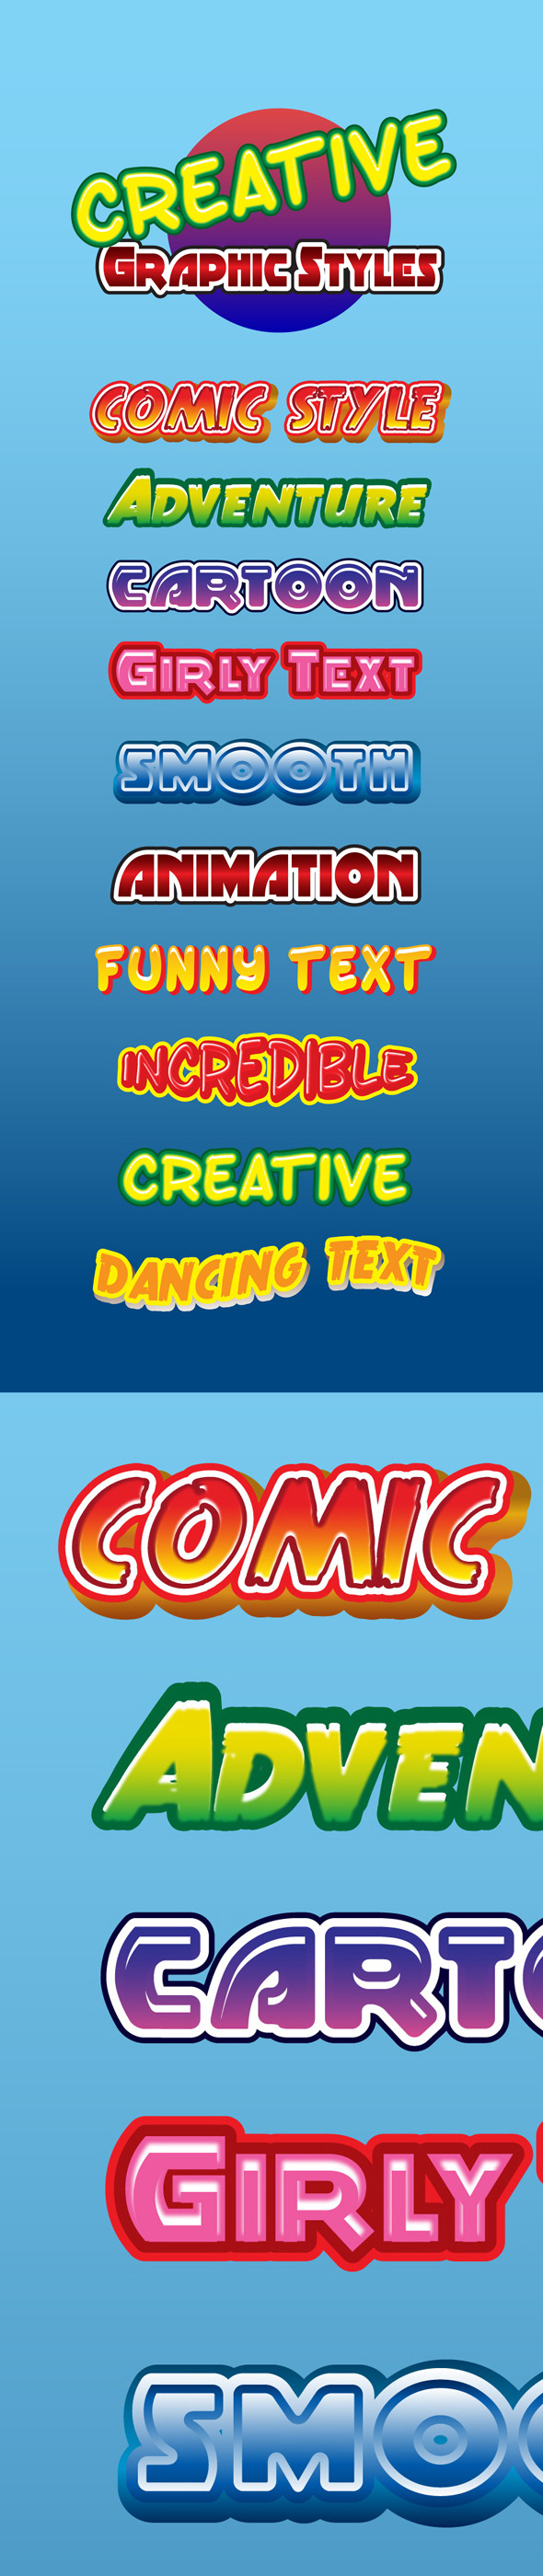 GraphicRiver Creative Graphic Styles for Ai 8975556